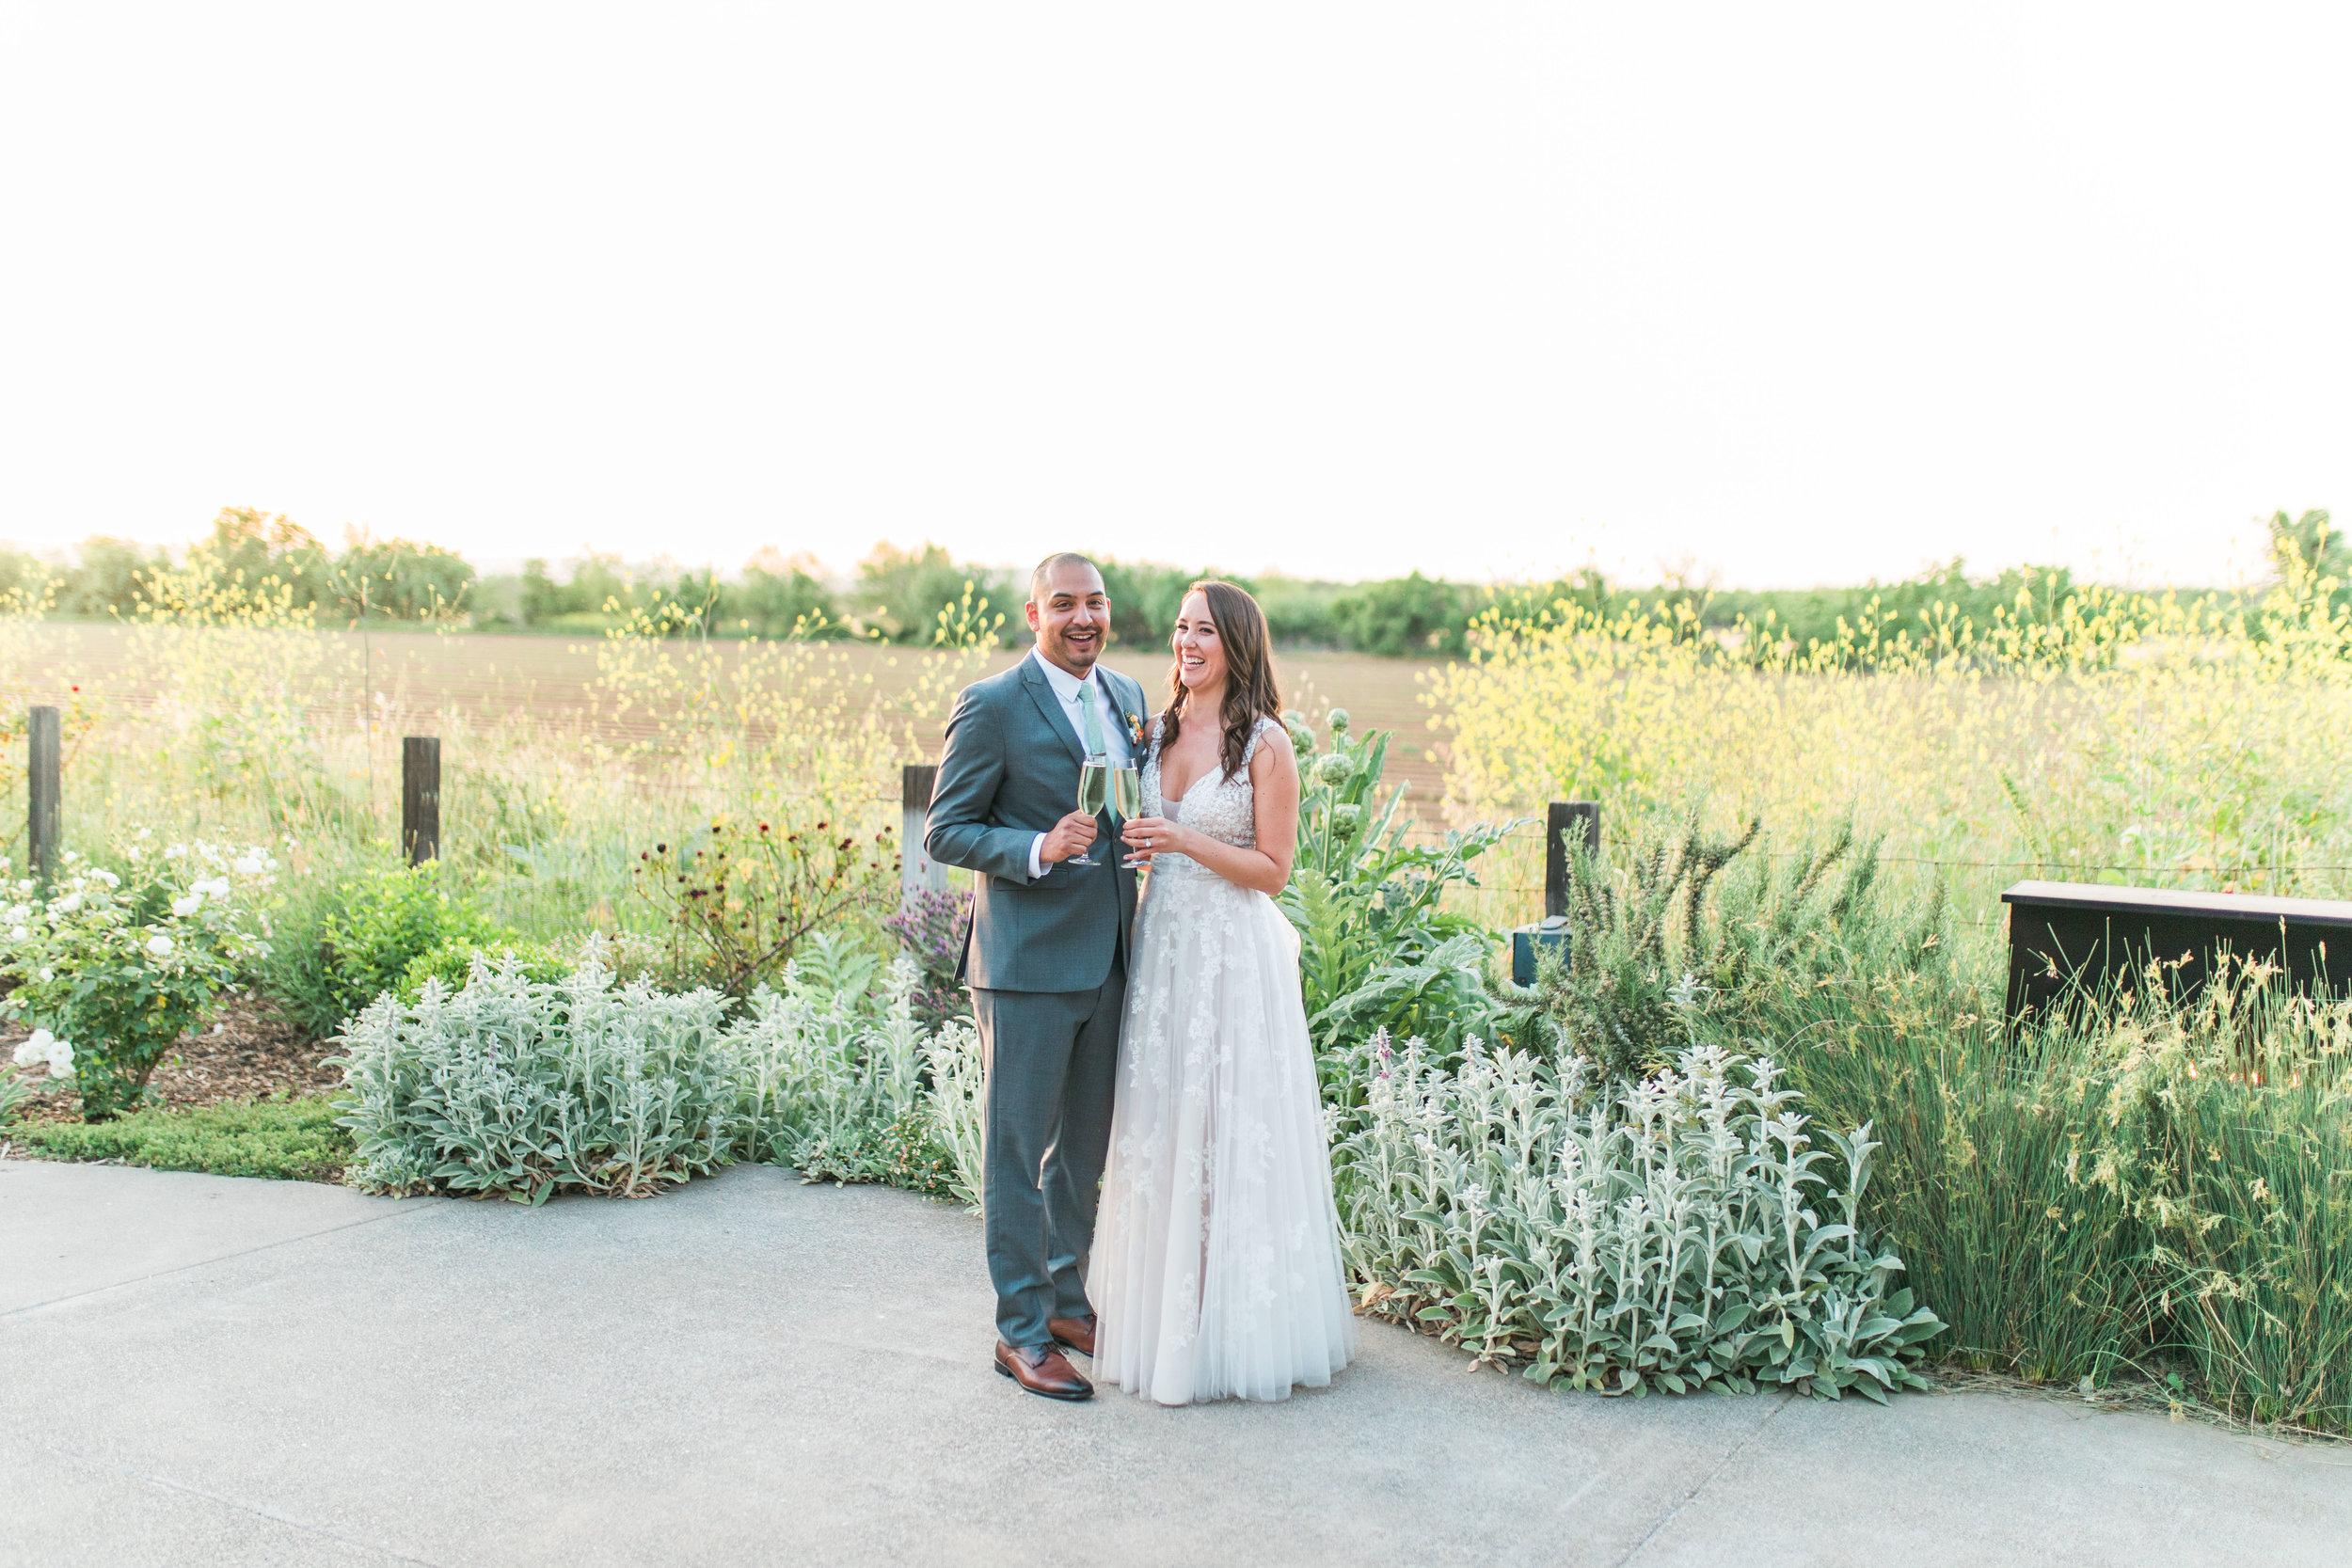 Tess-Jesse-Wedding-SP-by-JBJ-Pictures-19.jpg